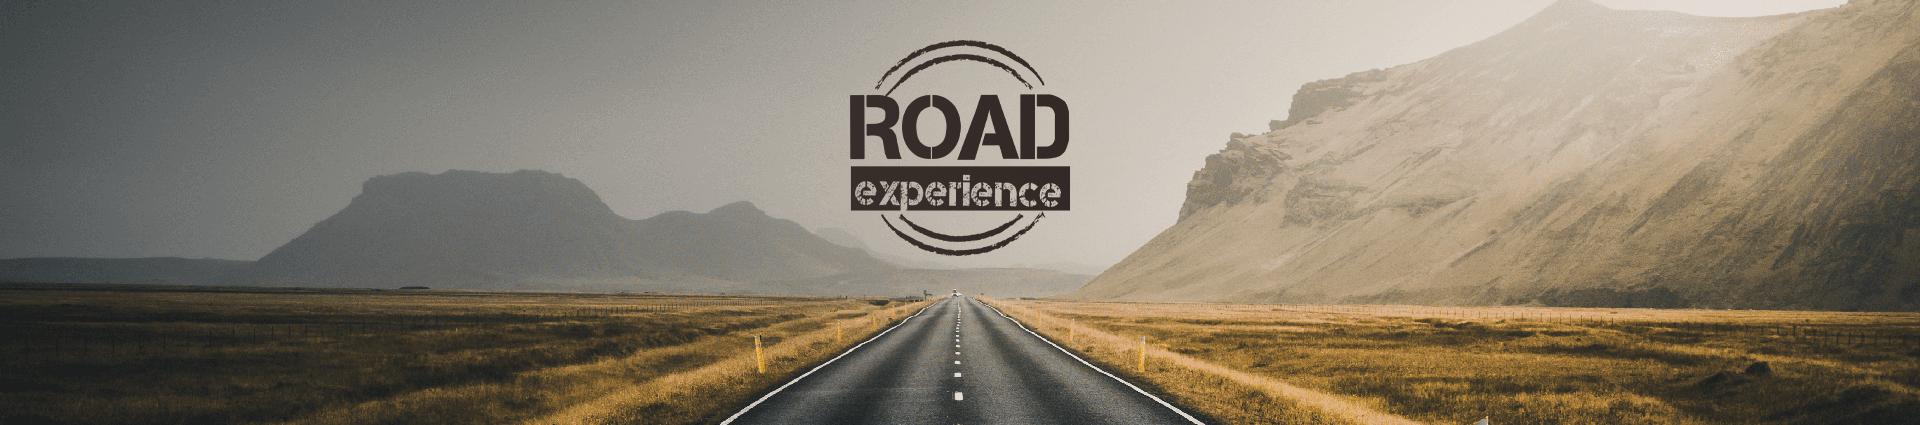 Road-Experience-Header